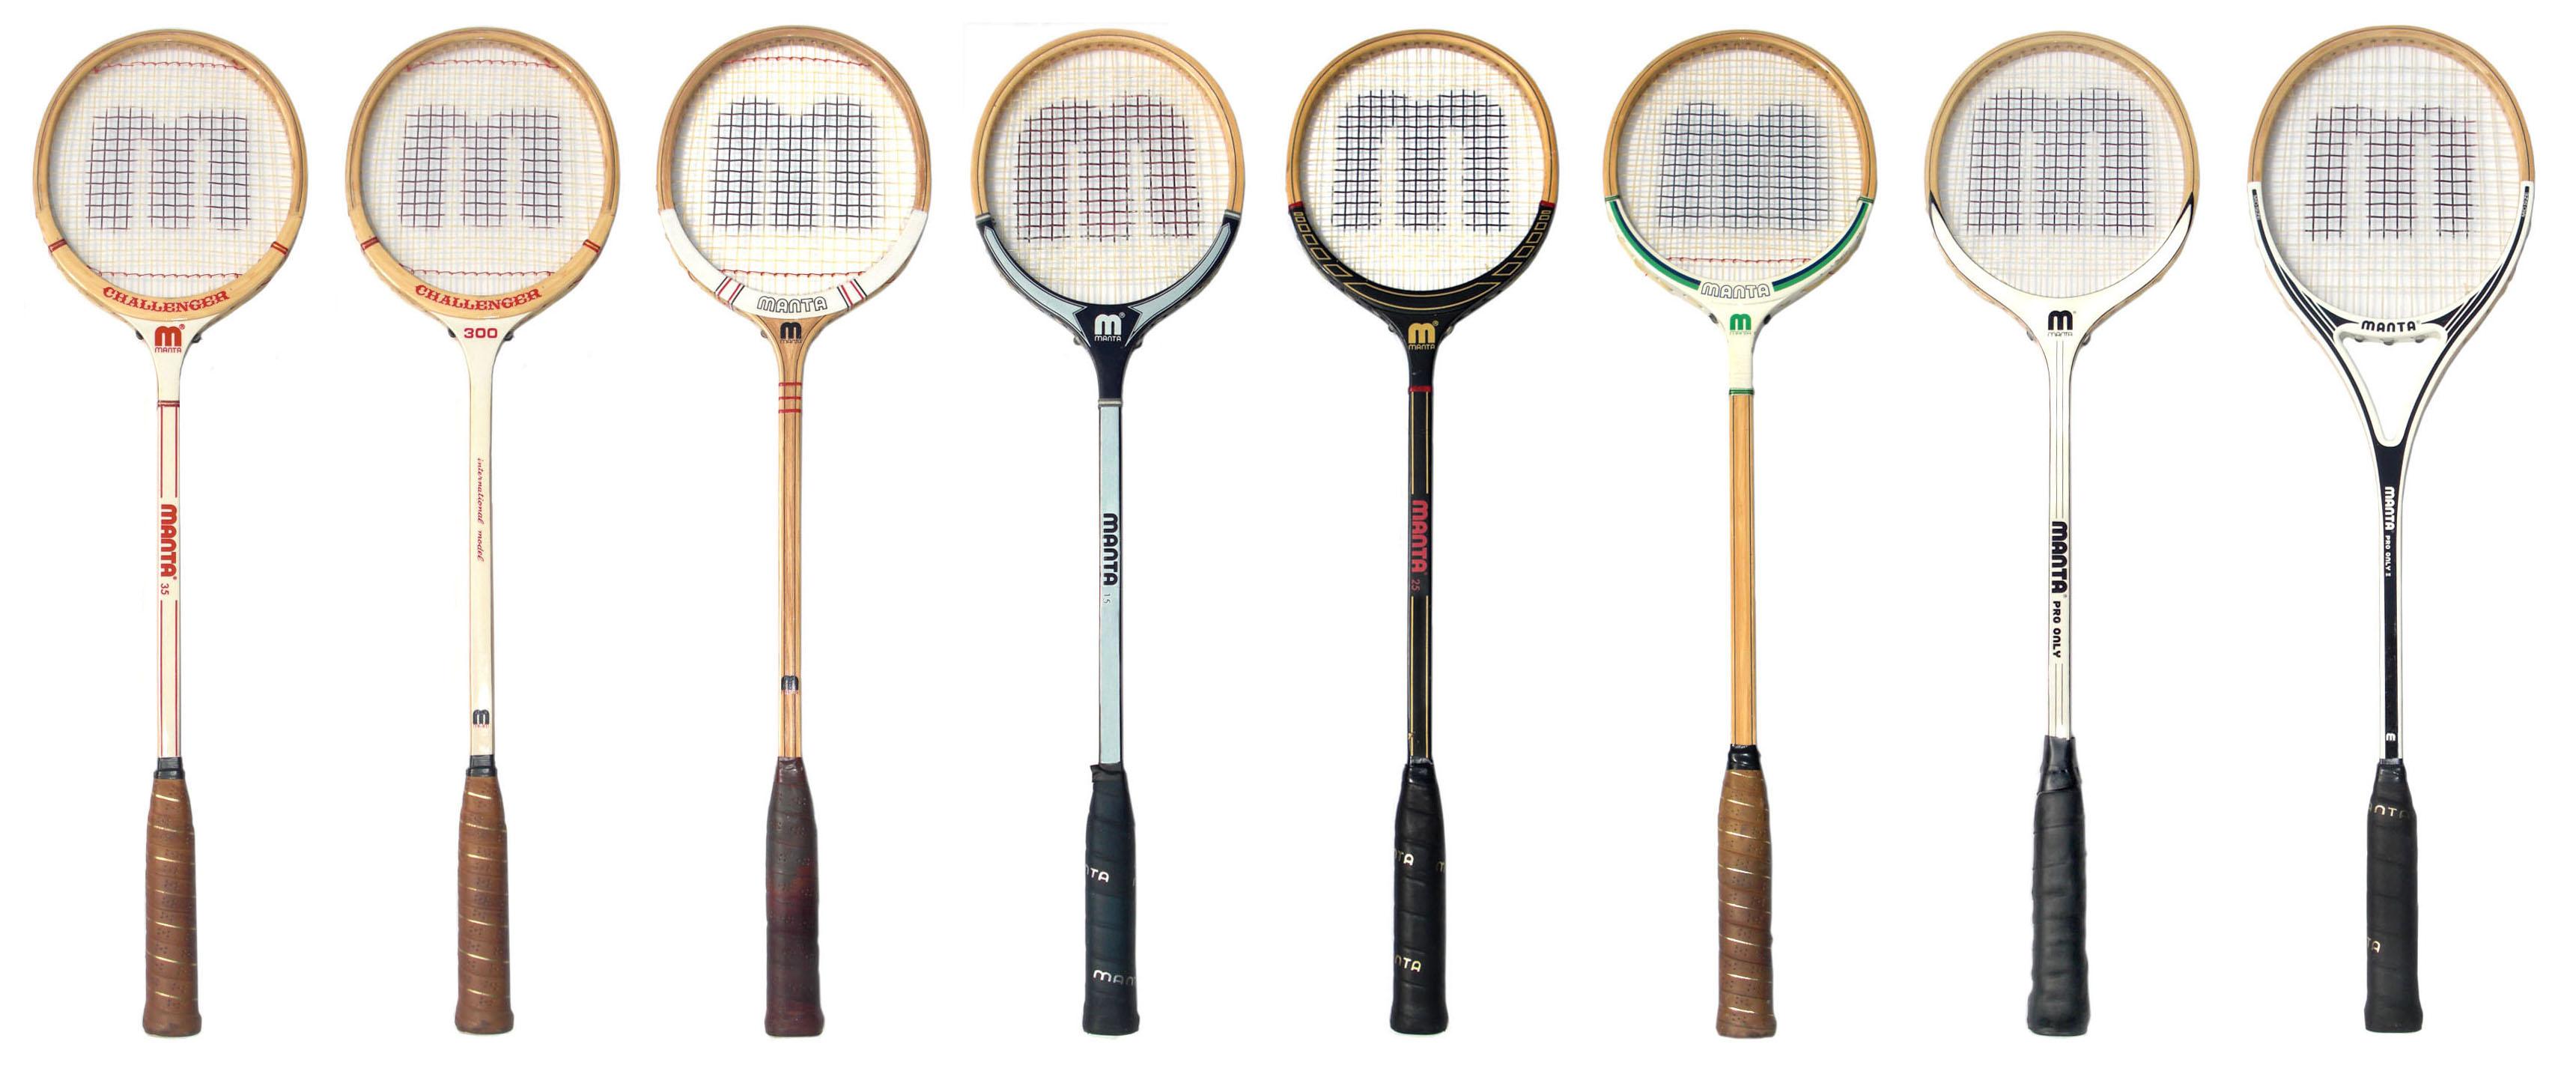 Wooden Squash Racquets